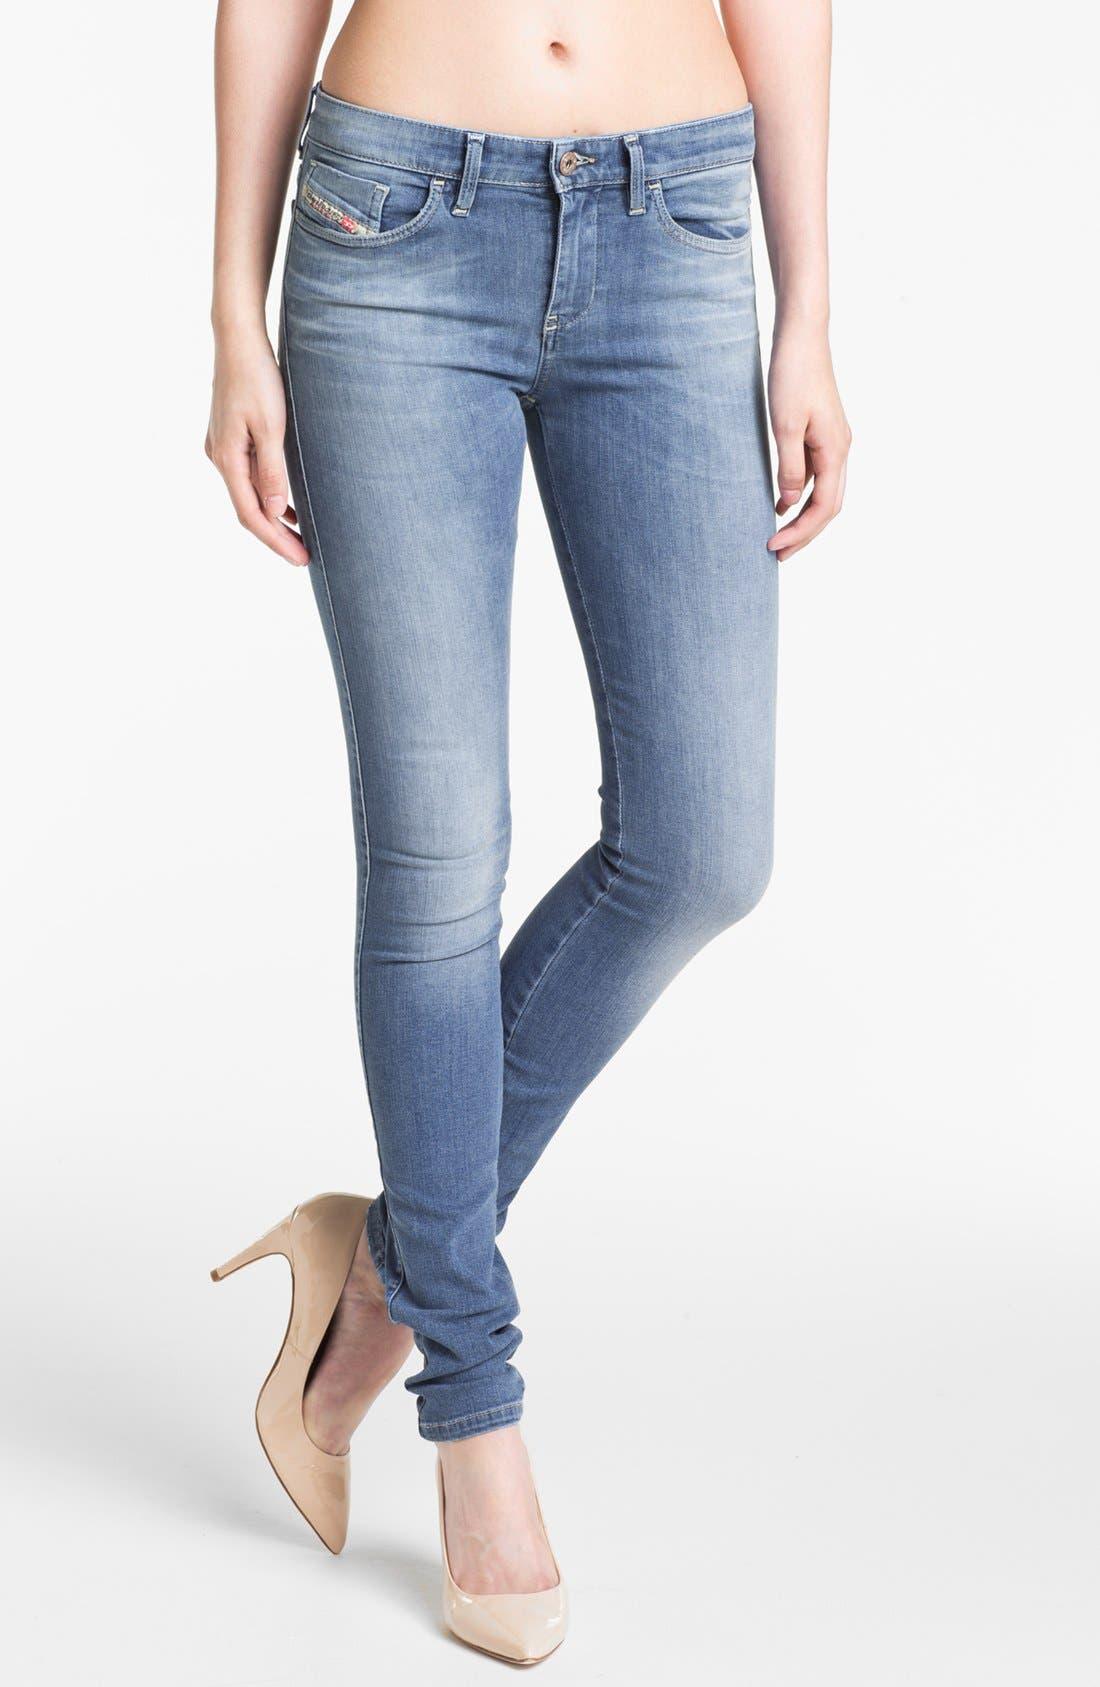 Main Image - DIESEL® 'Skinzee' Stretch Skinny Jeans (Light Denim)